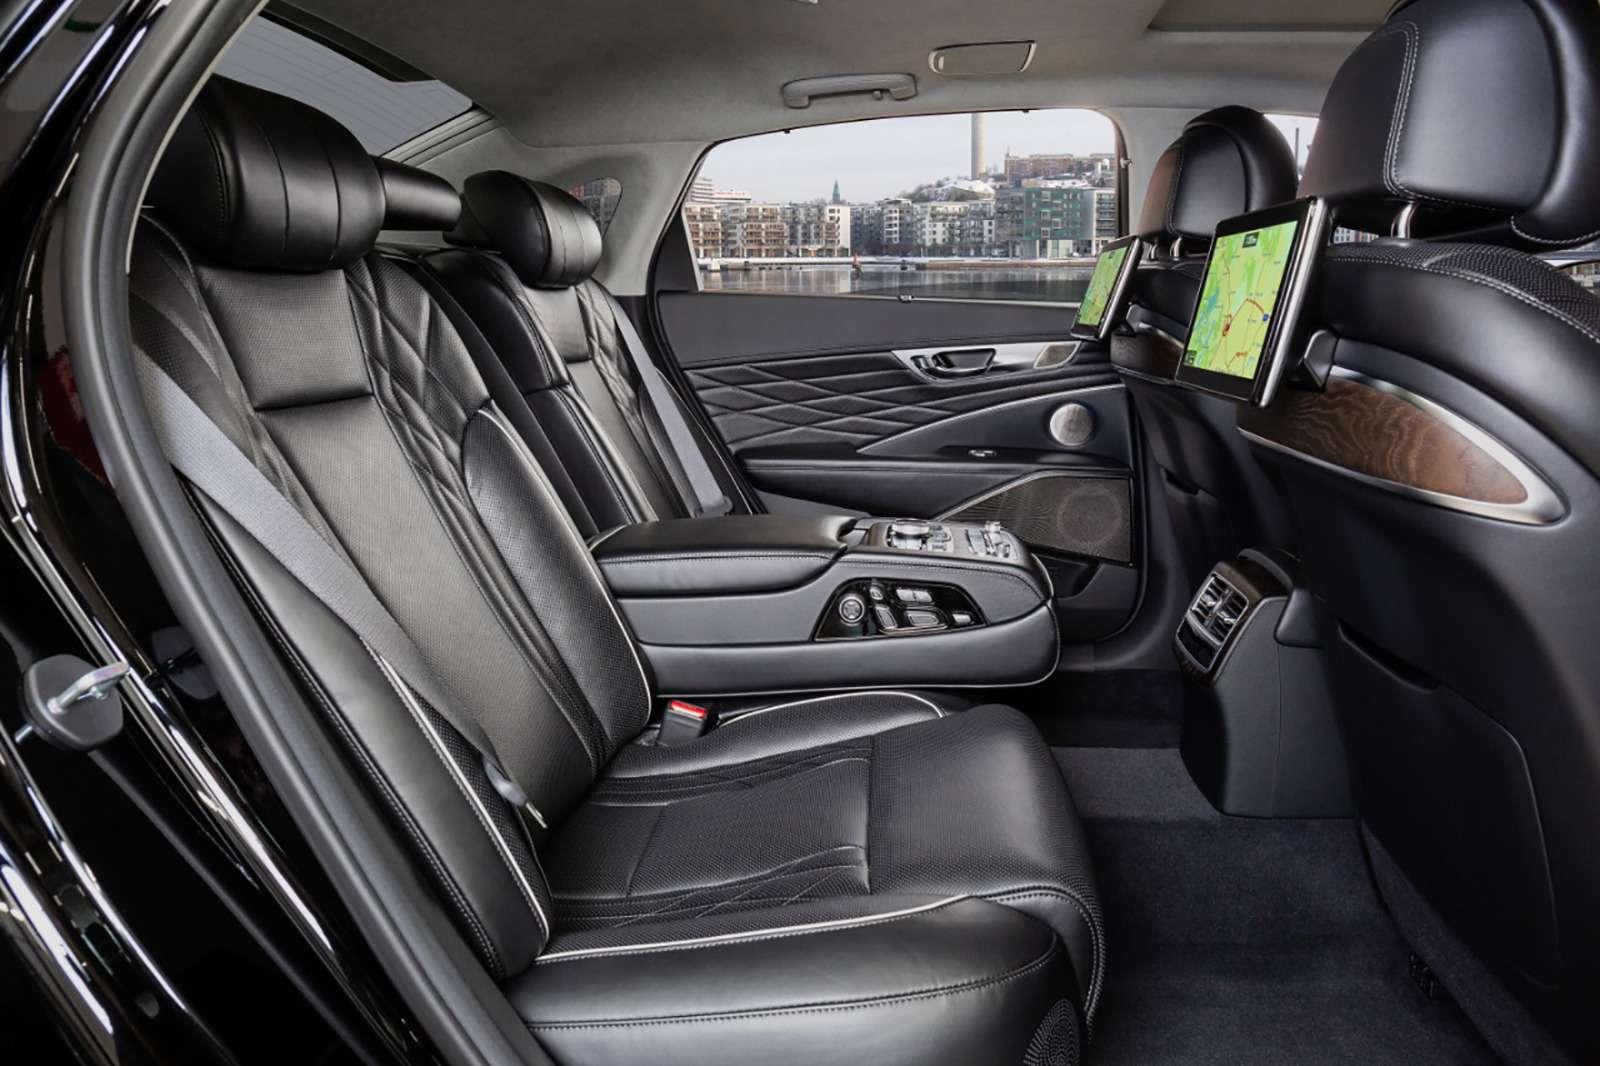 Kiaназвала российские цены нафлагманский седан K900— фото 946140